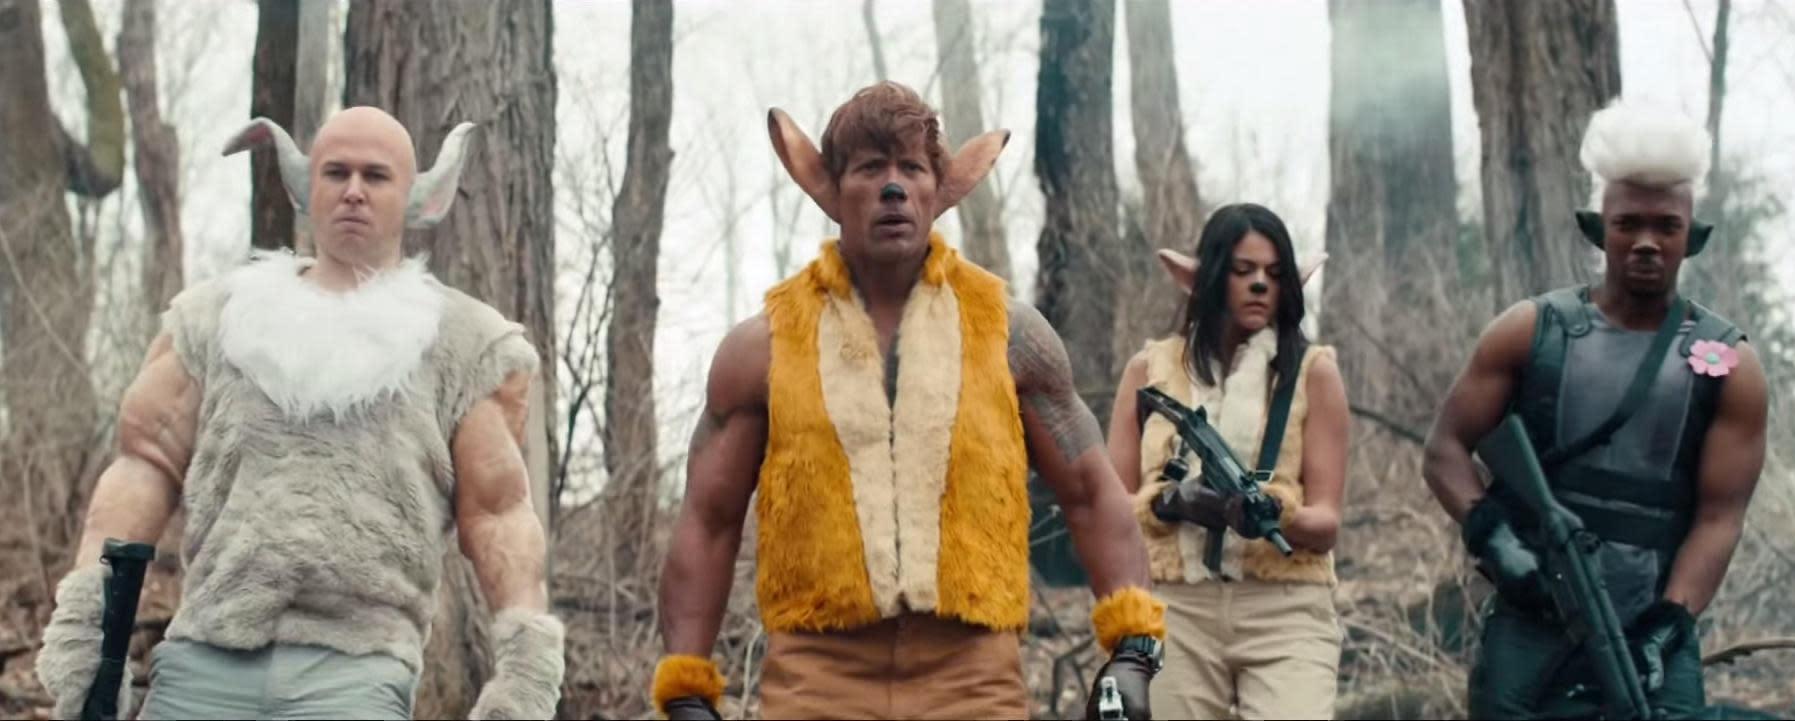 Dwayne 'The Rock' Johnson makes for an imposing 'Bambi'